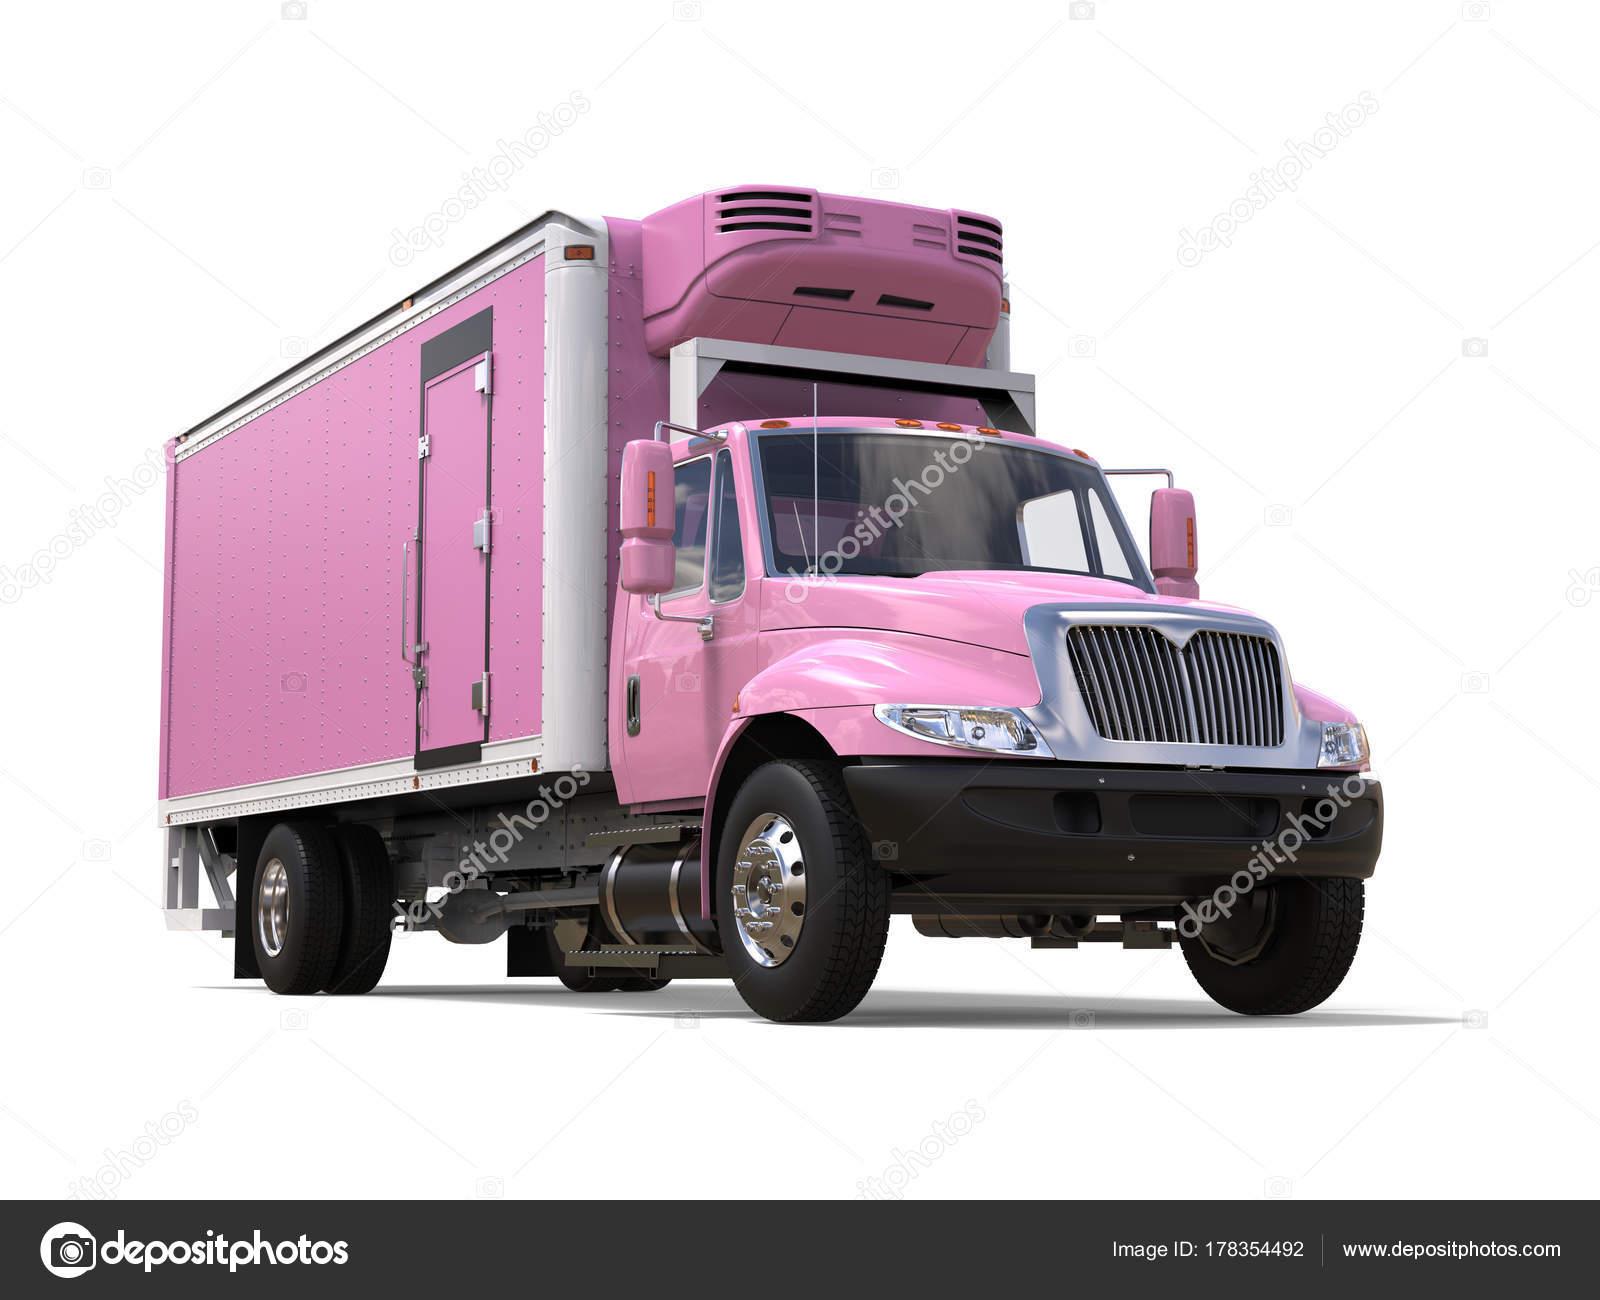 Amerikanischer Kühlschrank Transportieren : Rosa kühlschrank lkw ladung closeup erschossen u stockfoto